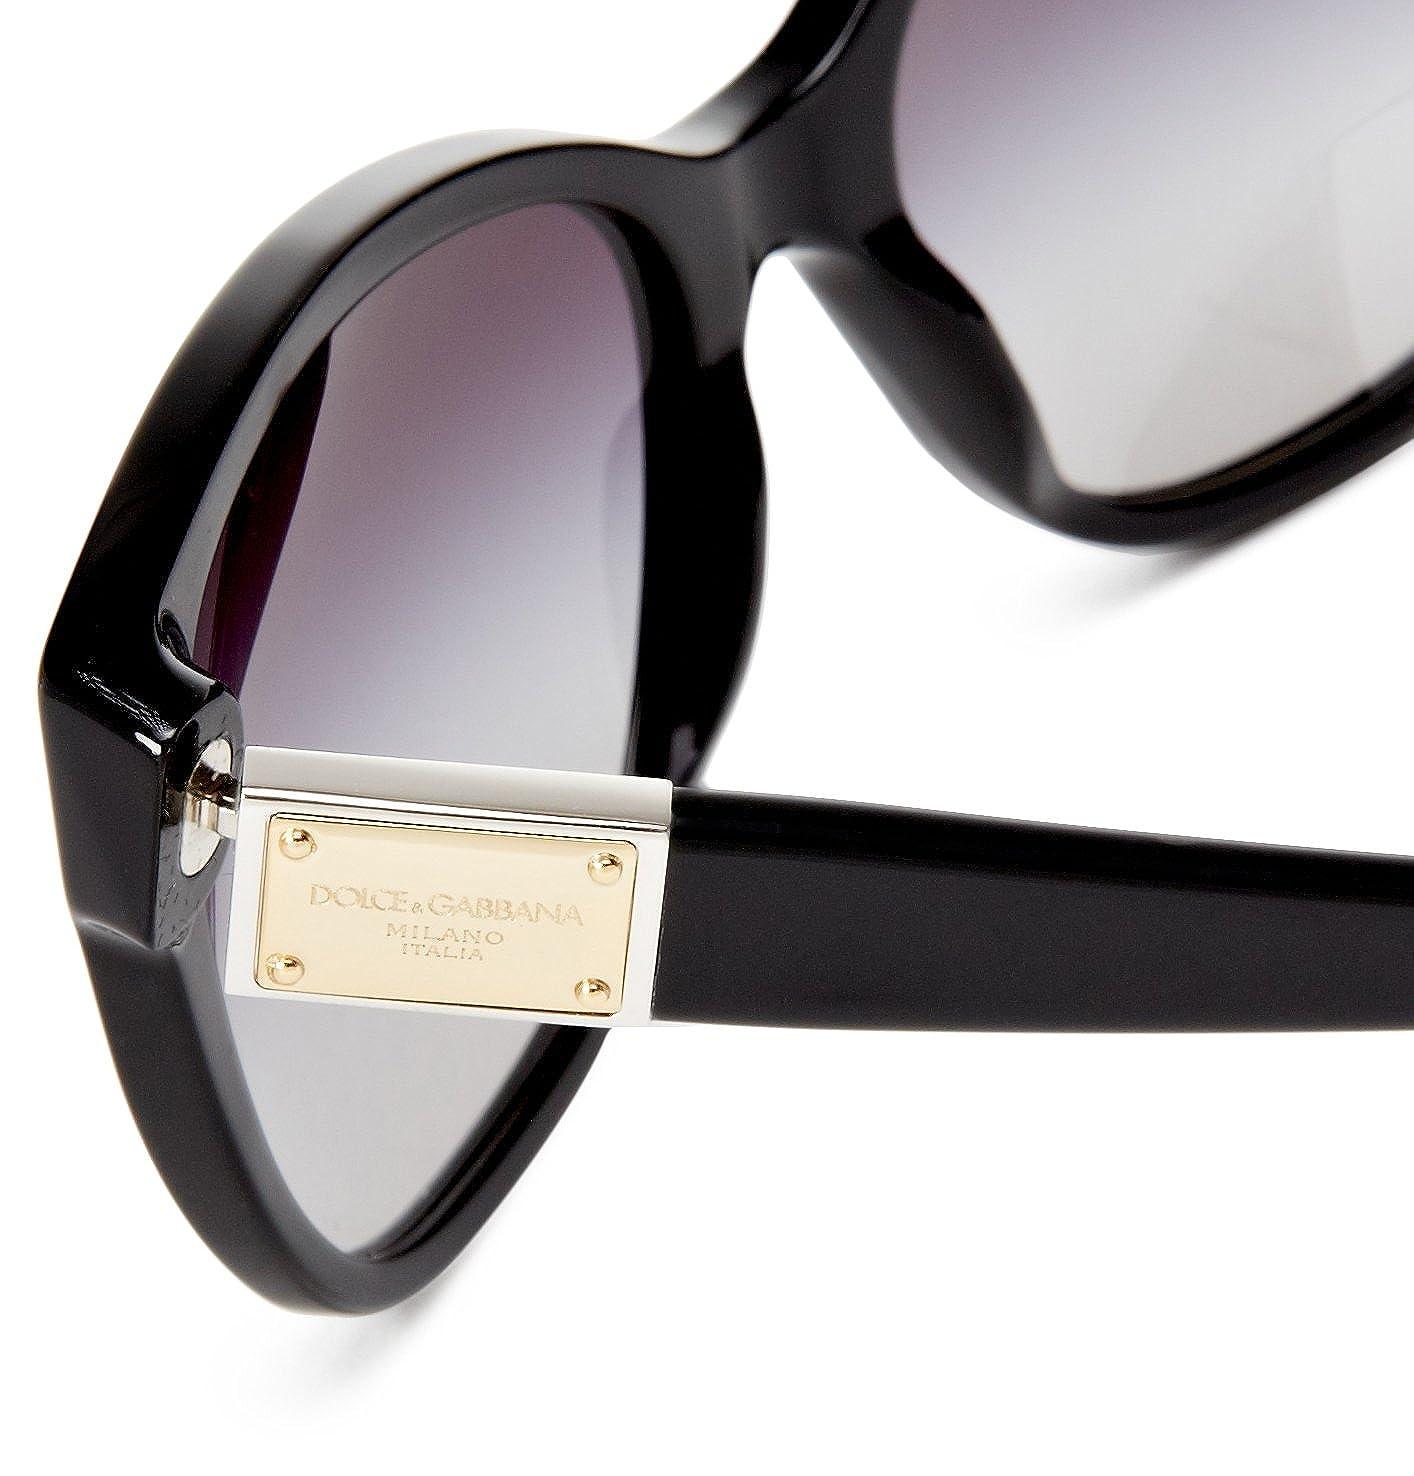 Amazon.com: D & G Dolce & Gabbana 0dg4195 26971356 mariposa ...